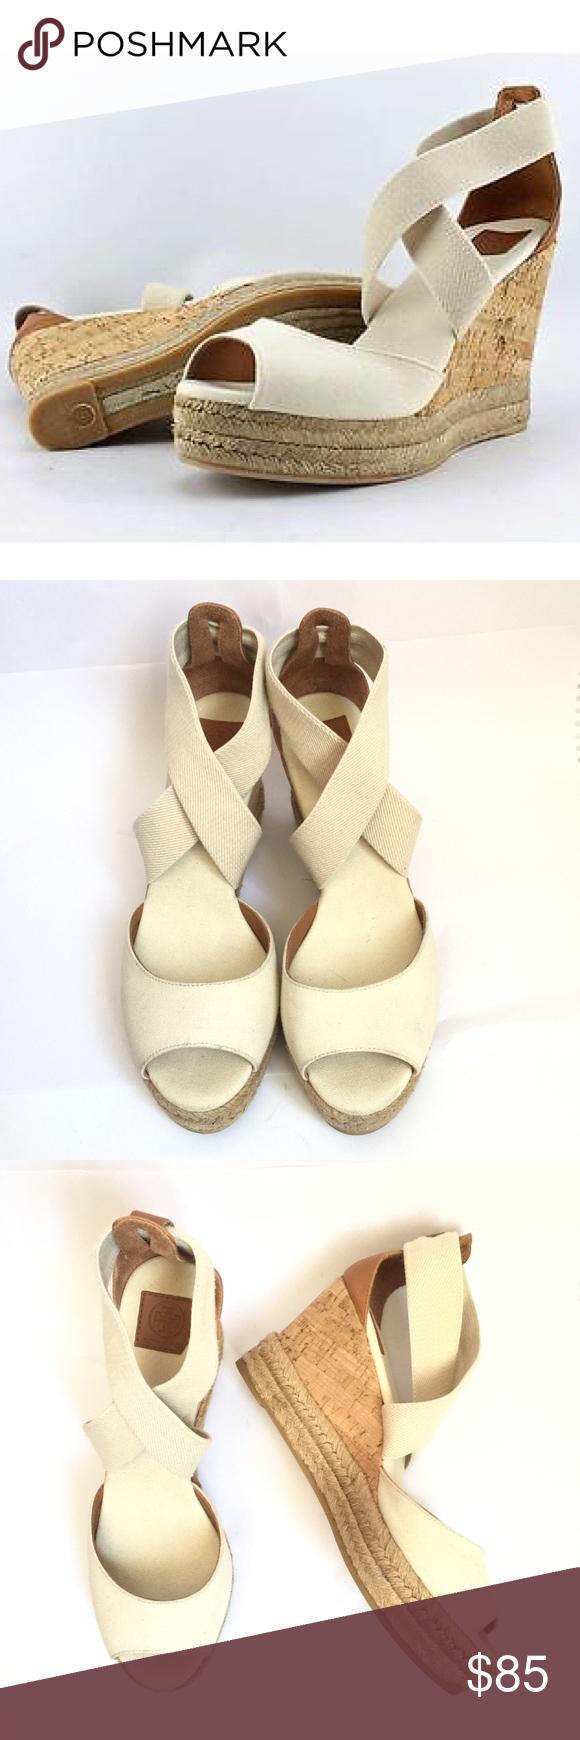 a9a0264b99 TORY BURCH - 85MM Peep-Toe Cork Wedge Sandals